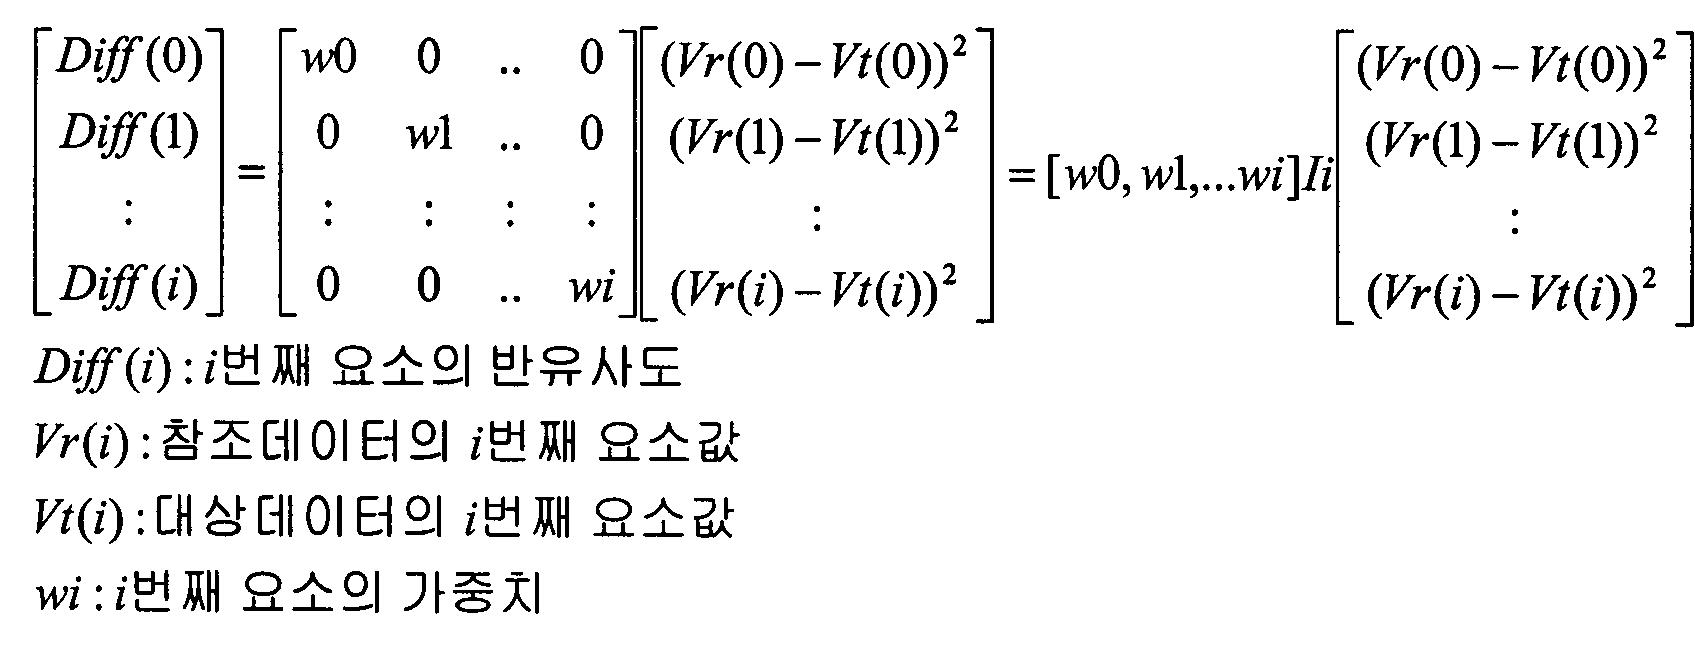 Figure 112000004812986-pat00003